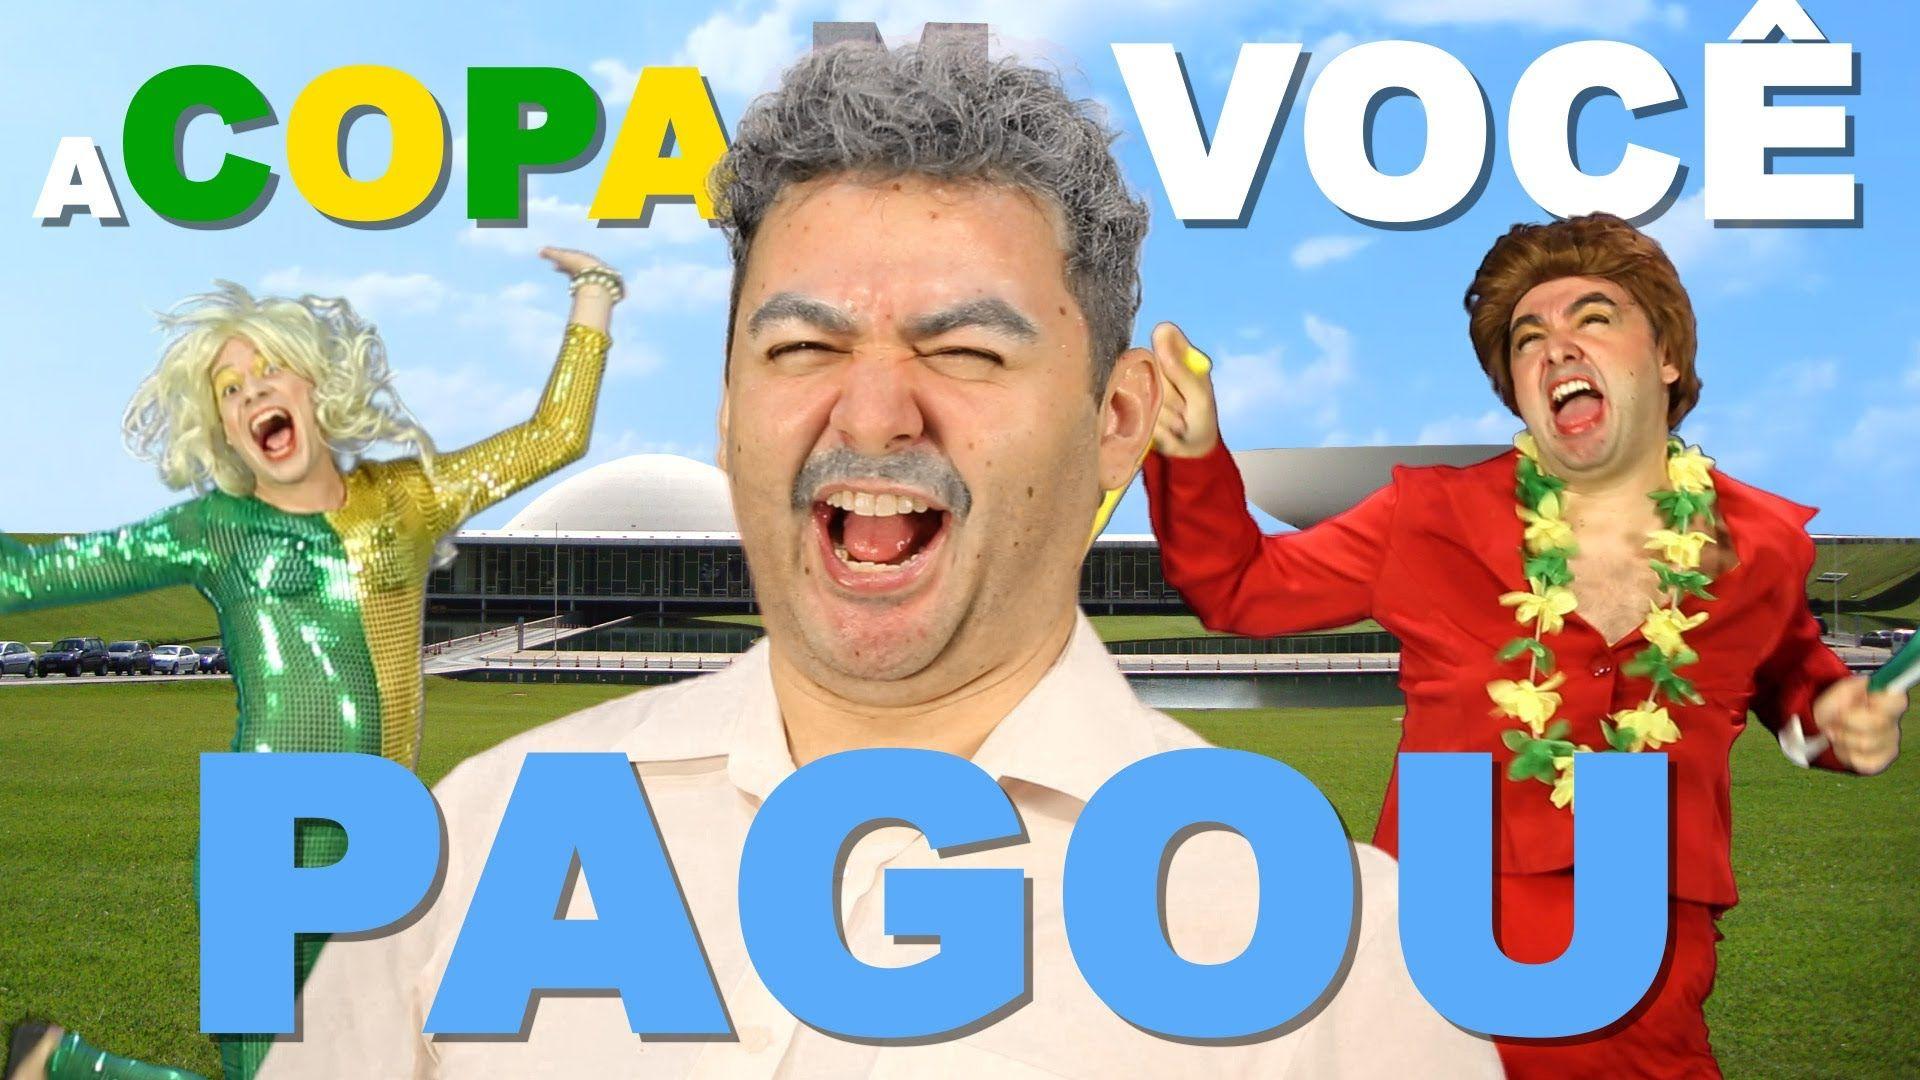 A Copa Voce Pagou Parodia We Are One Tema Da Copa 2014 Galo